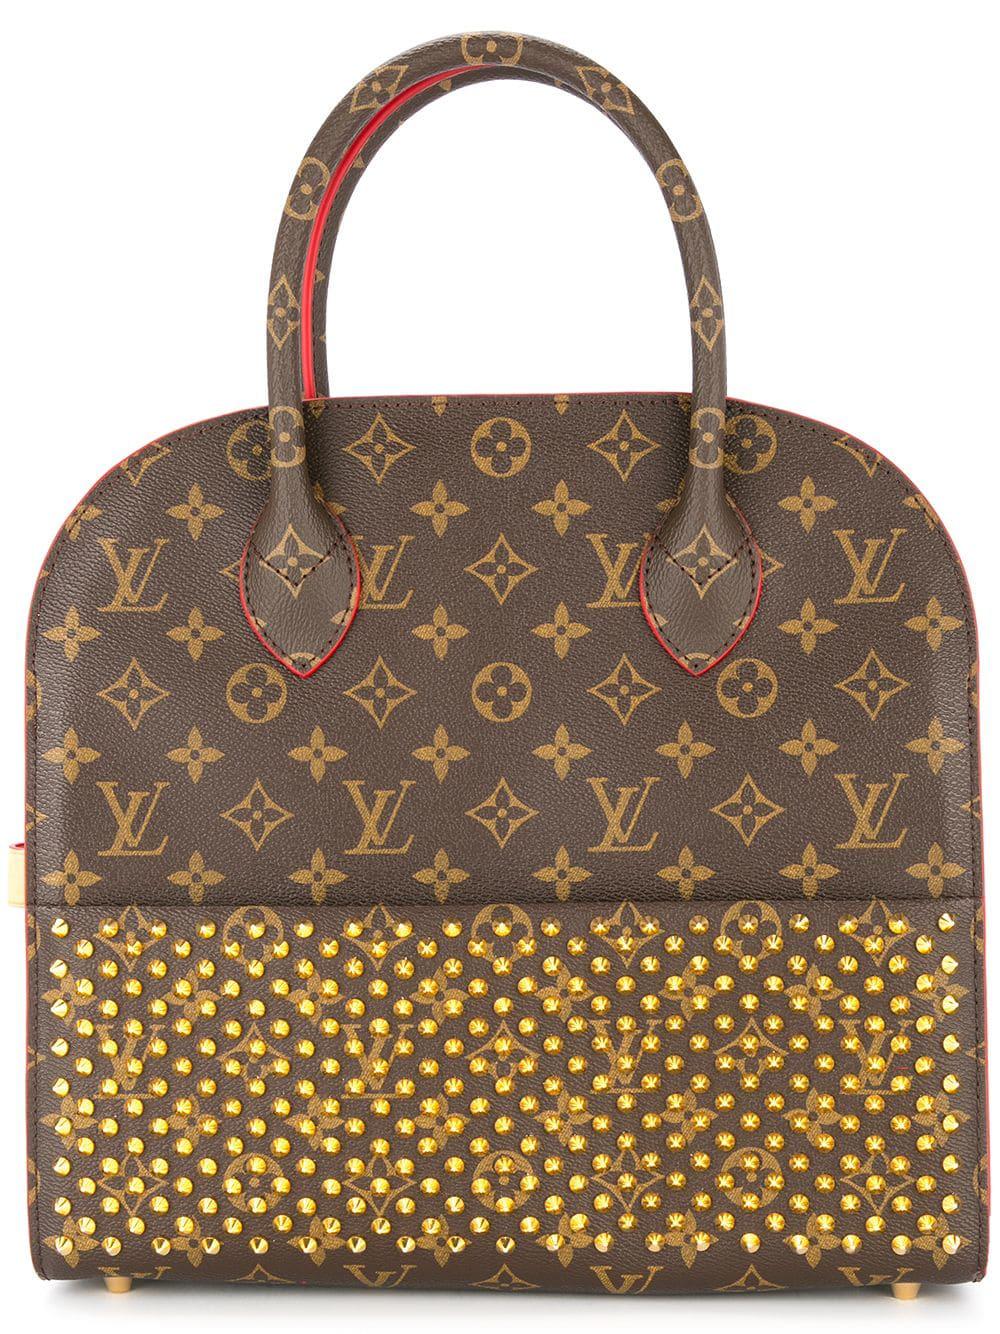 1dfe7e687686 Louis Vuitton Vintage Iconoclasts Tote - Brown. Farfetch